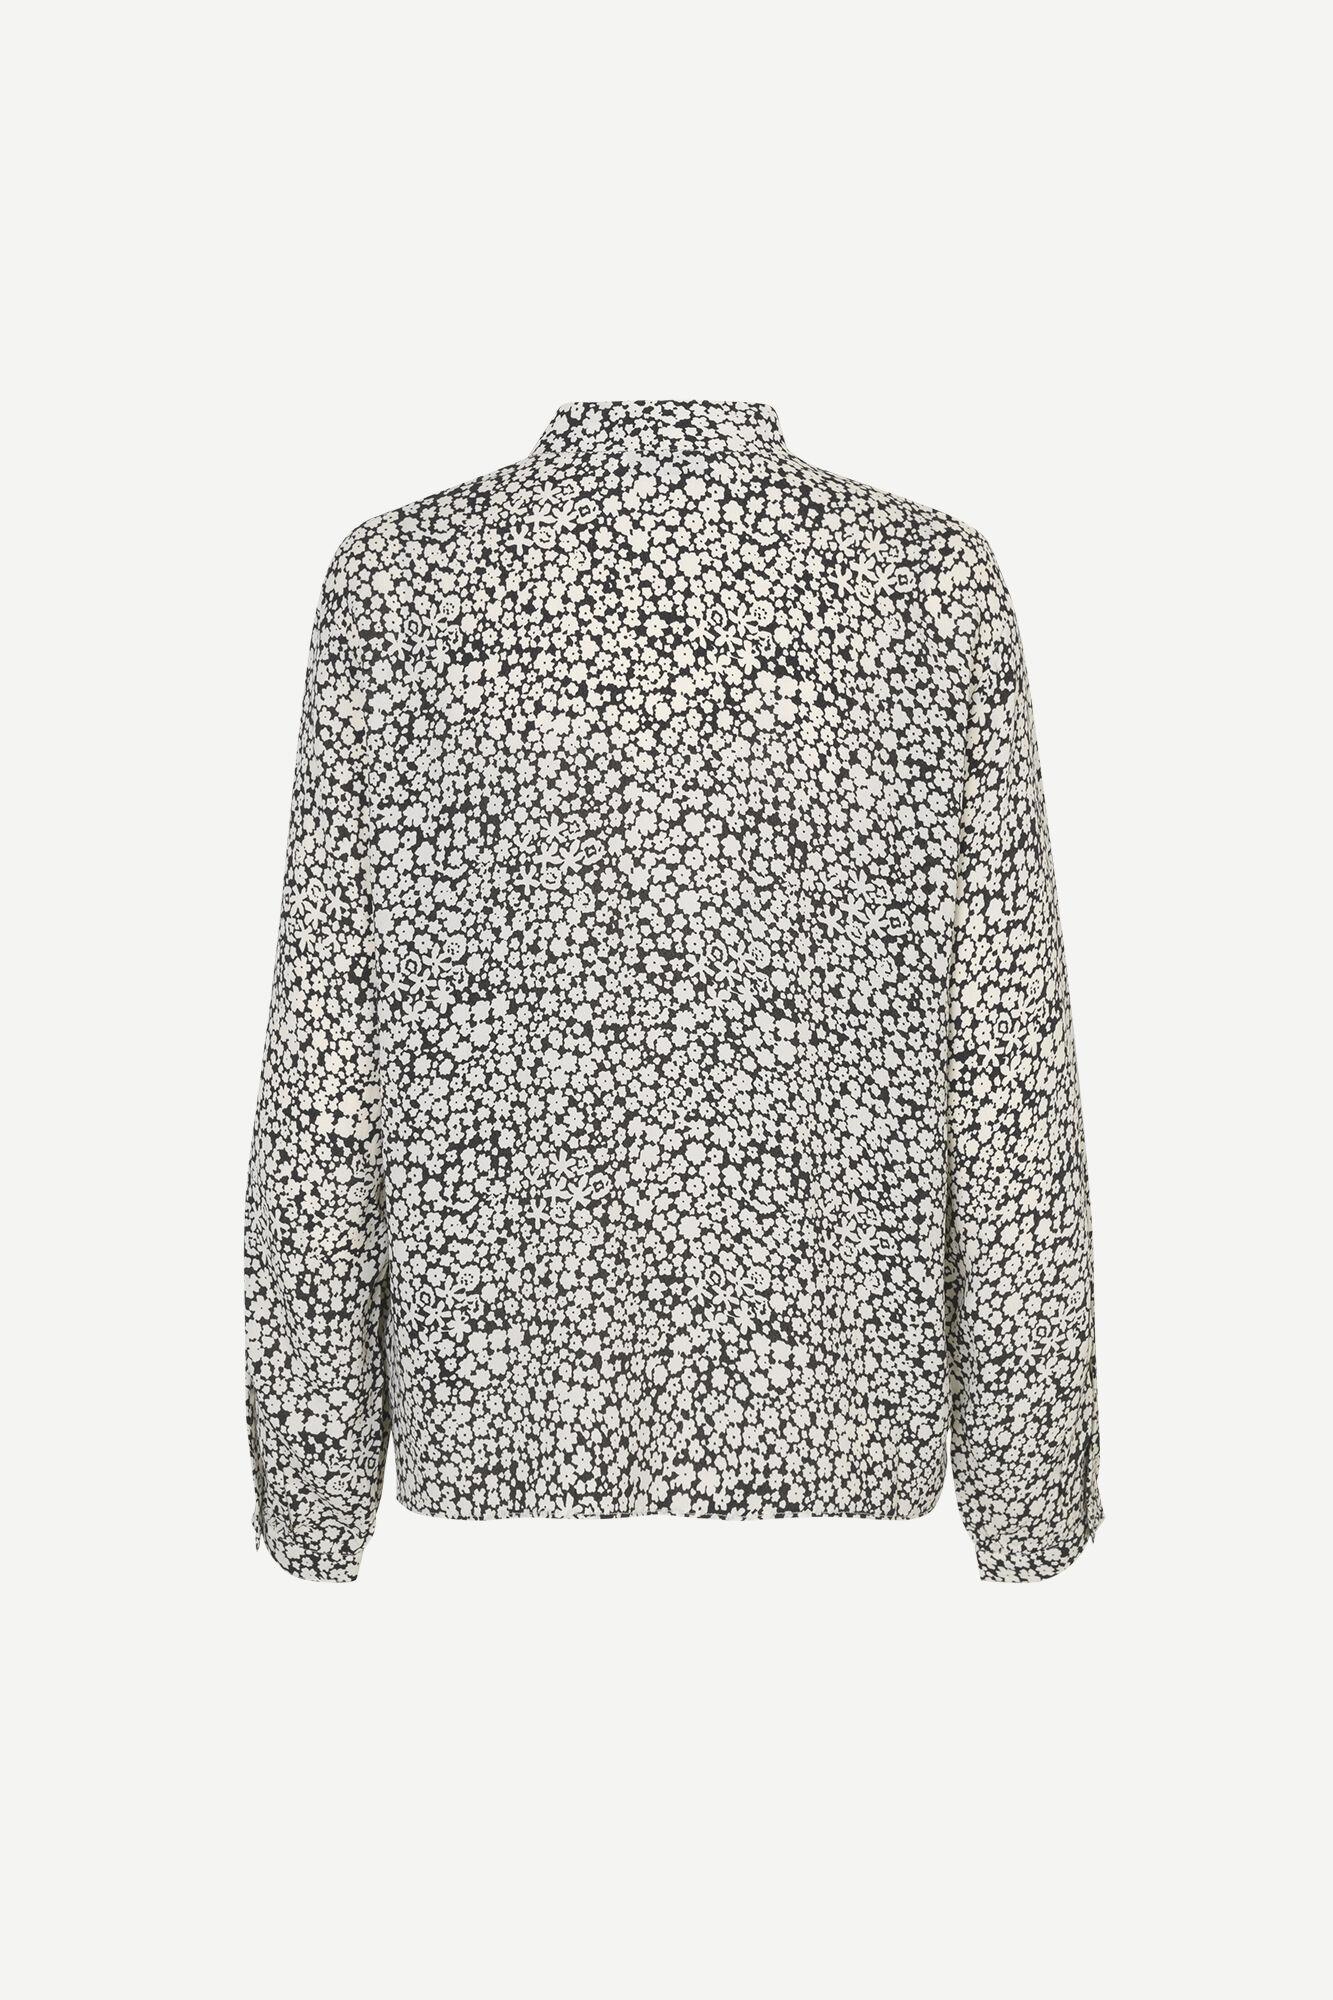 Merrit blouse aop 10867